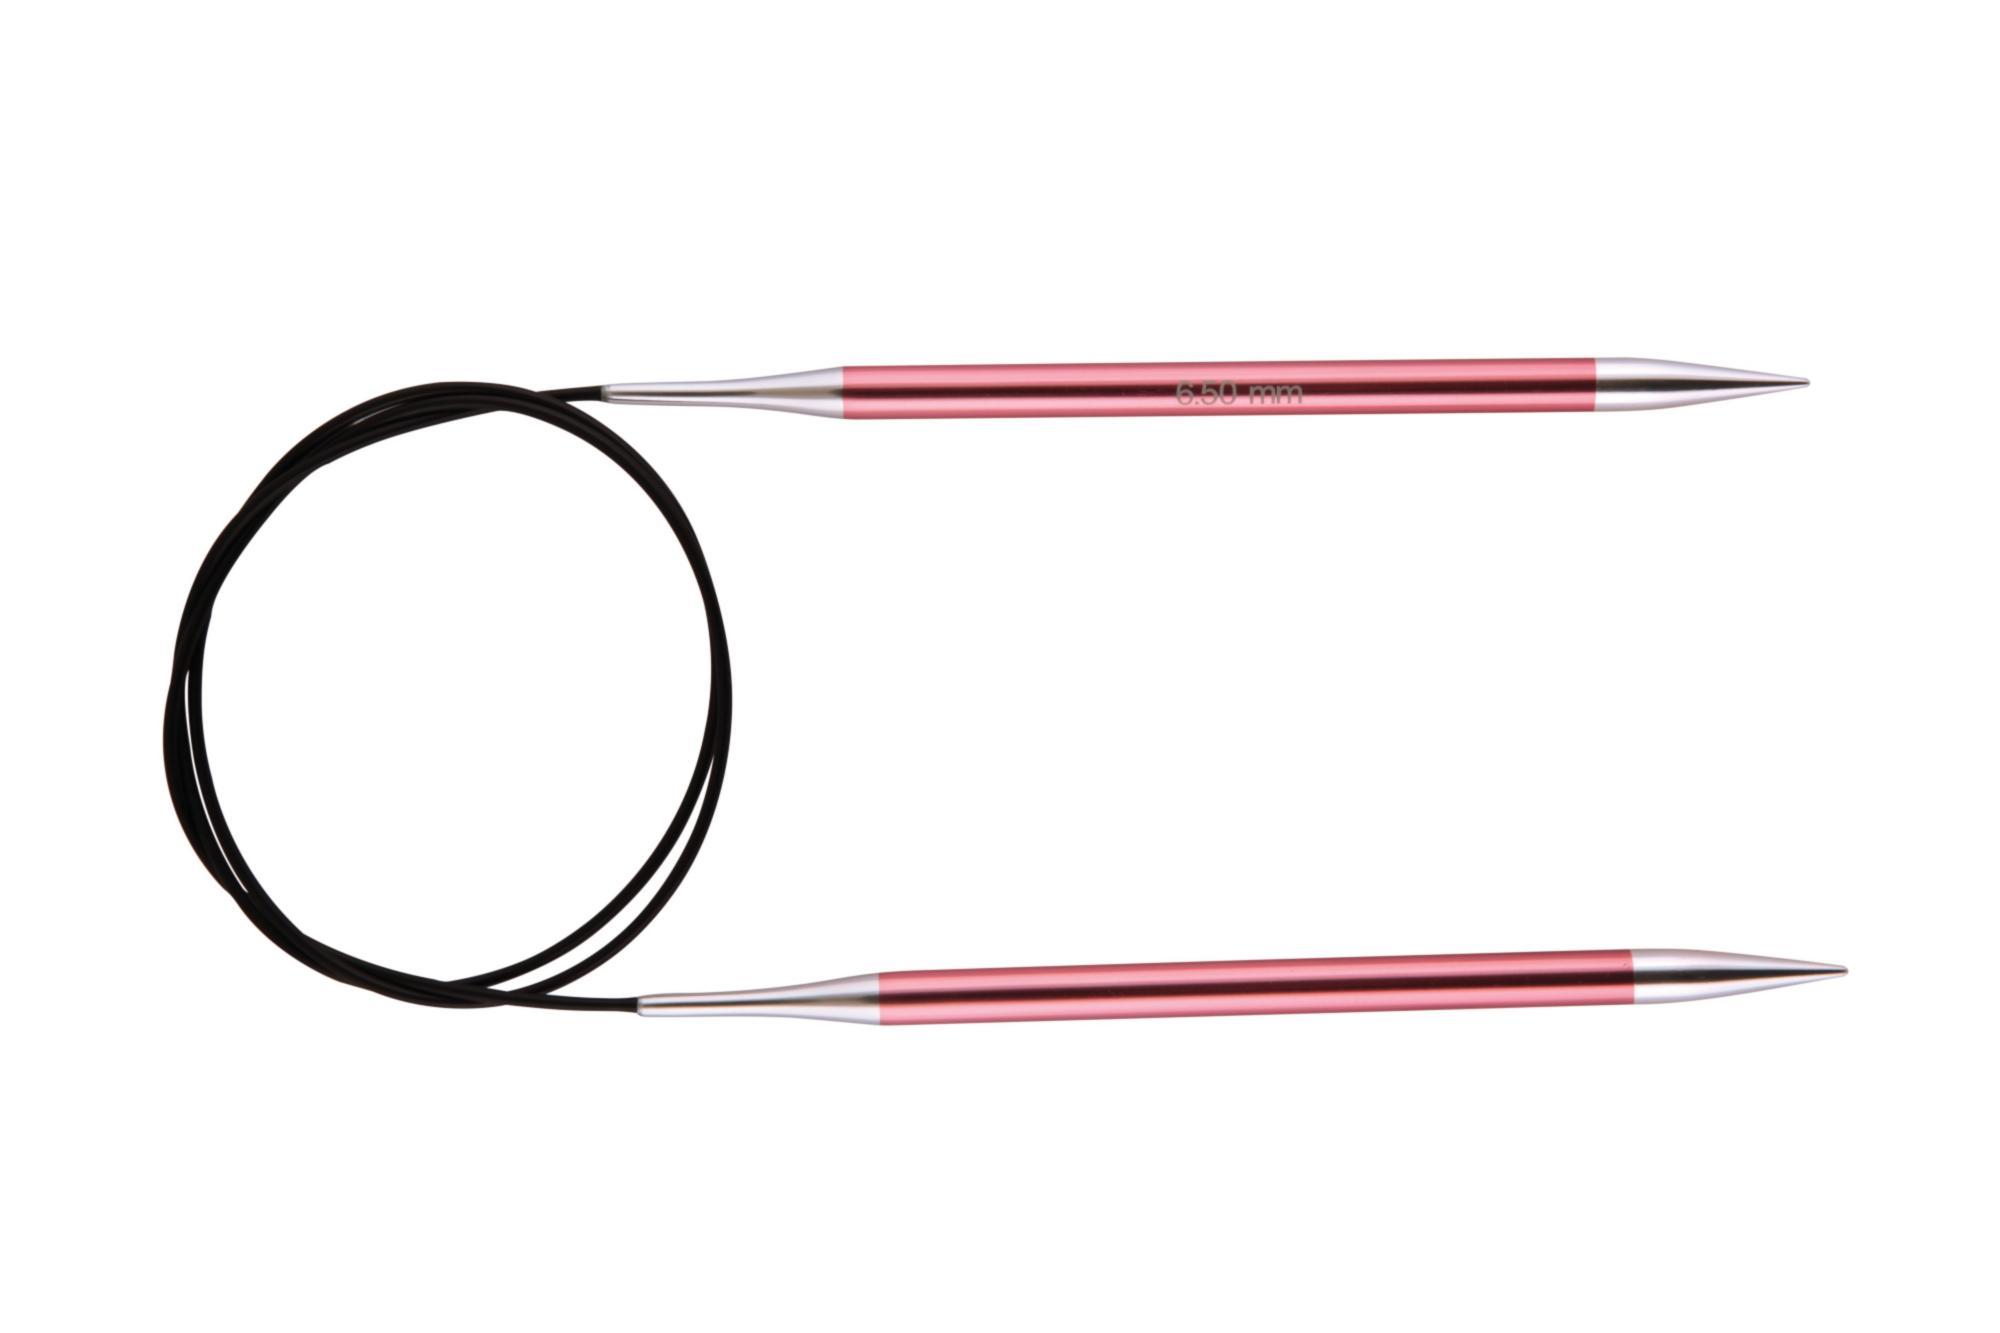 Спицы круговые 120 см Zing KnitPro, 47194, 6.50 мм